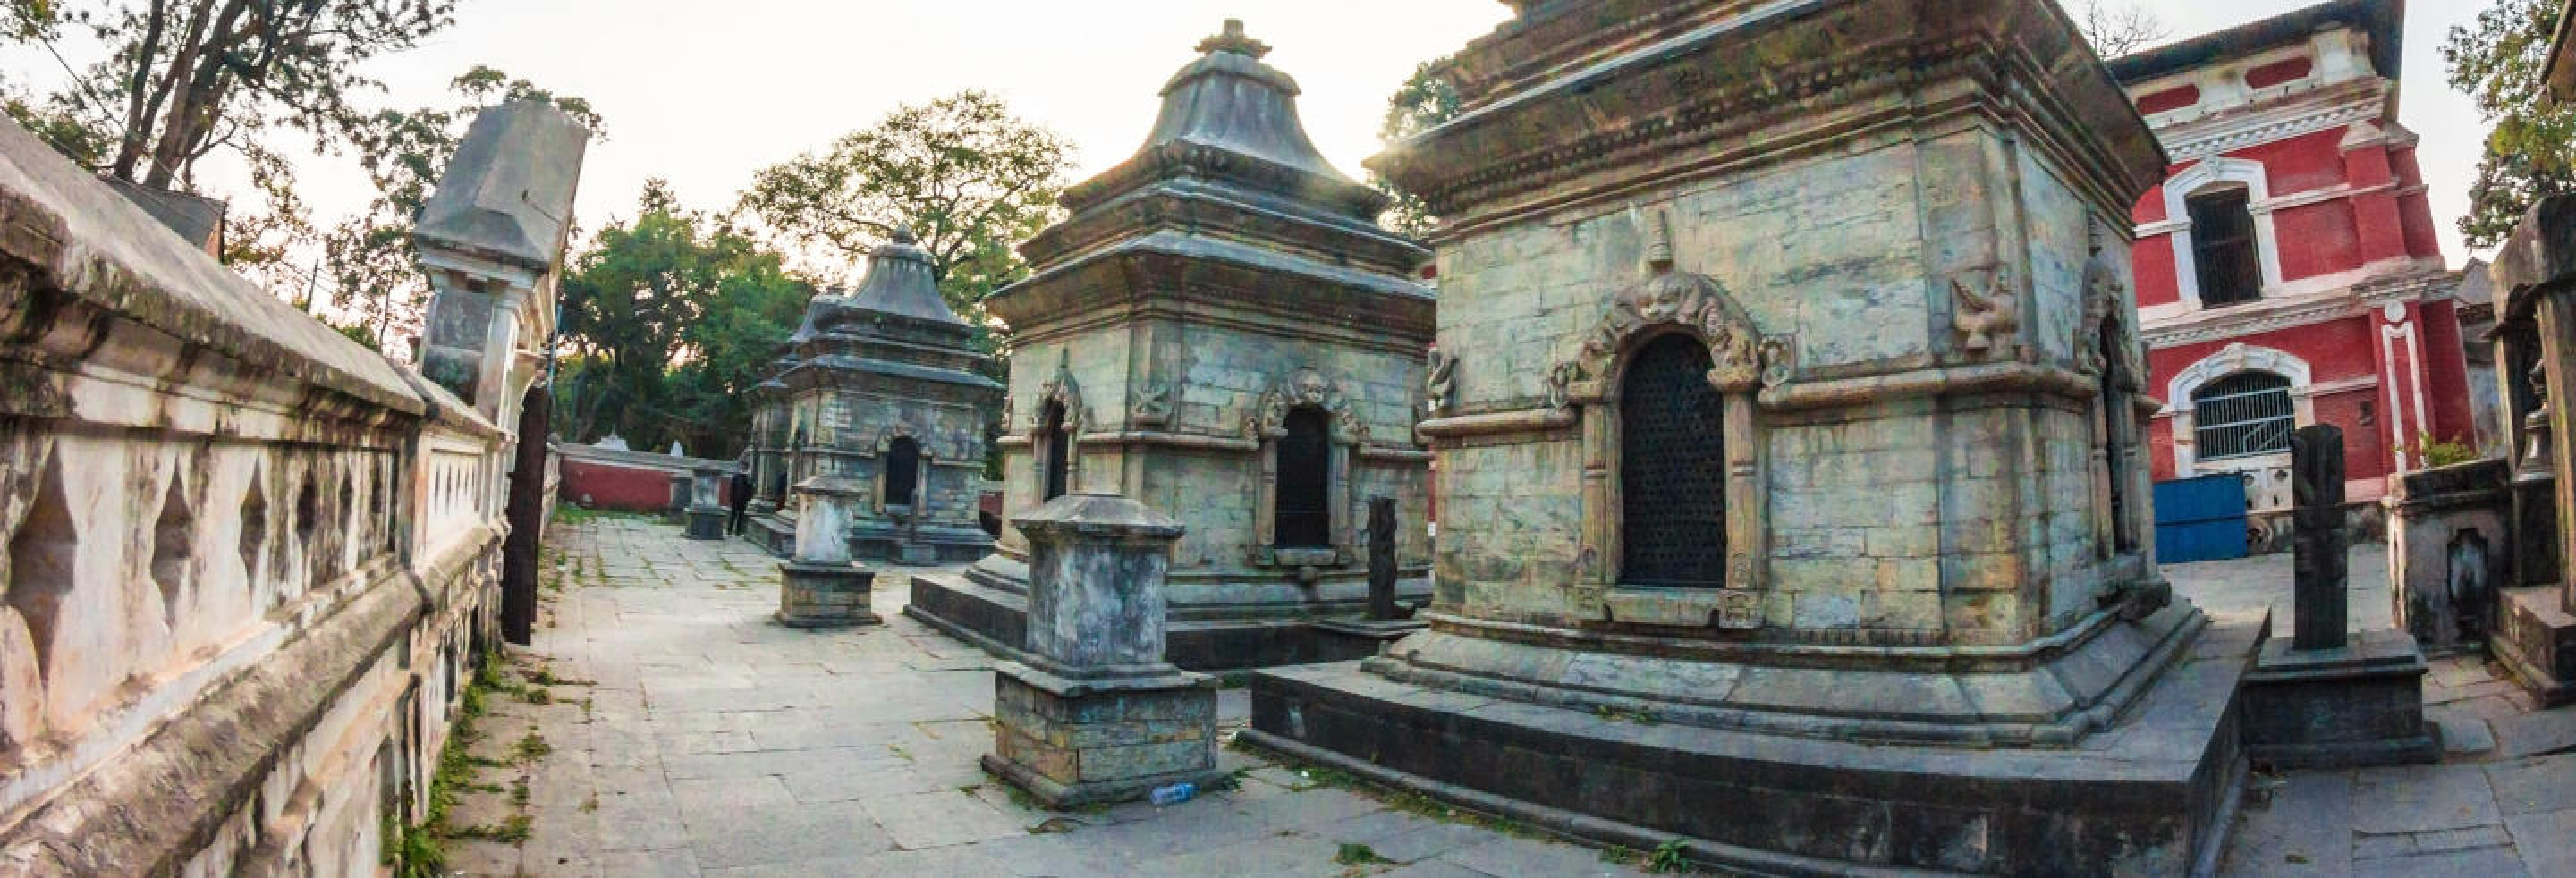 Visite spirituelle dans Katmandou